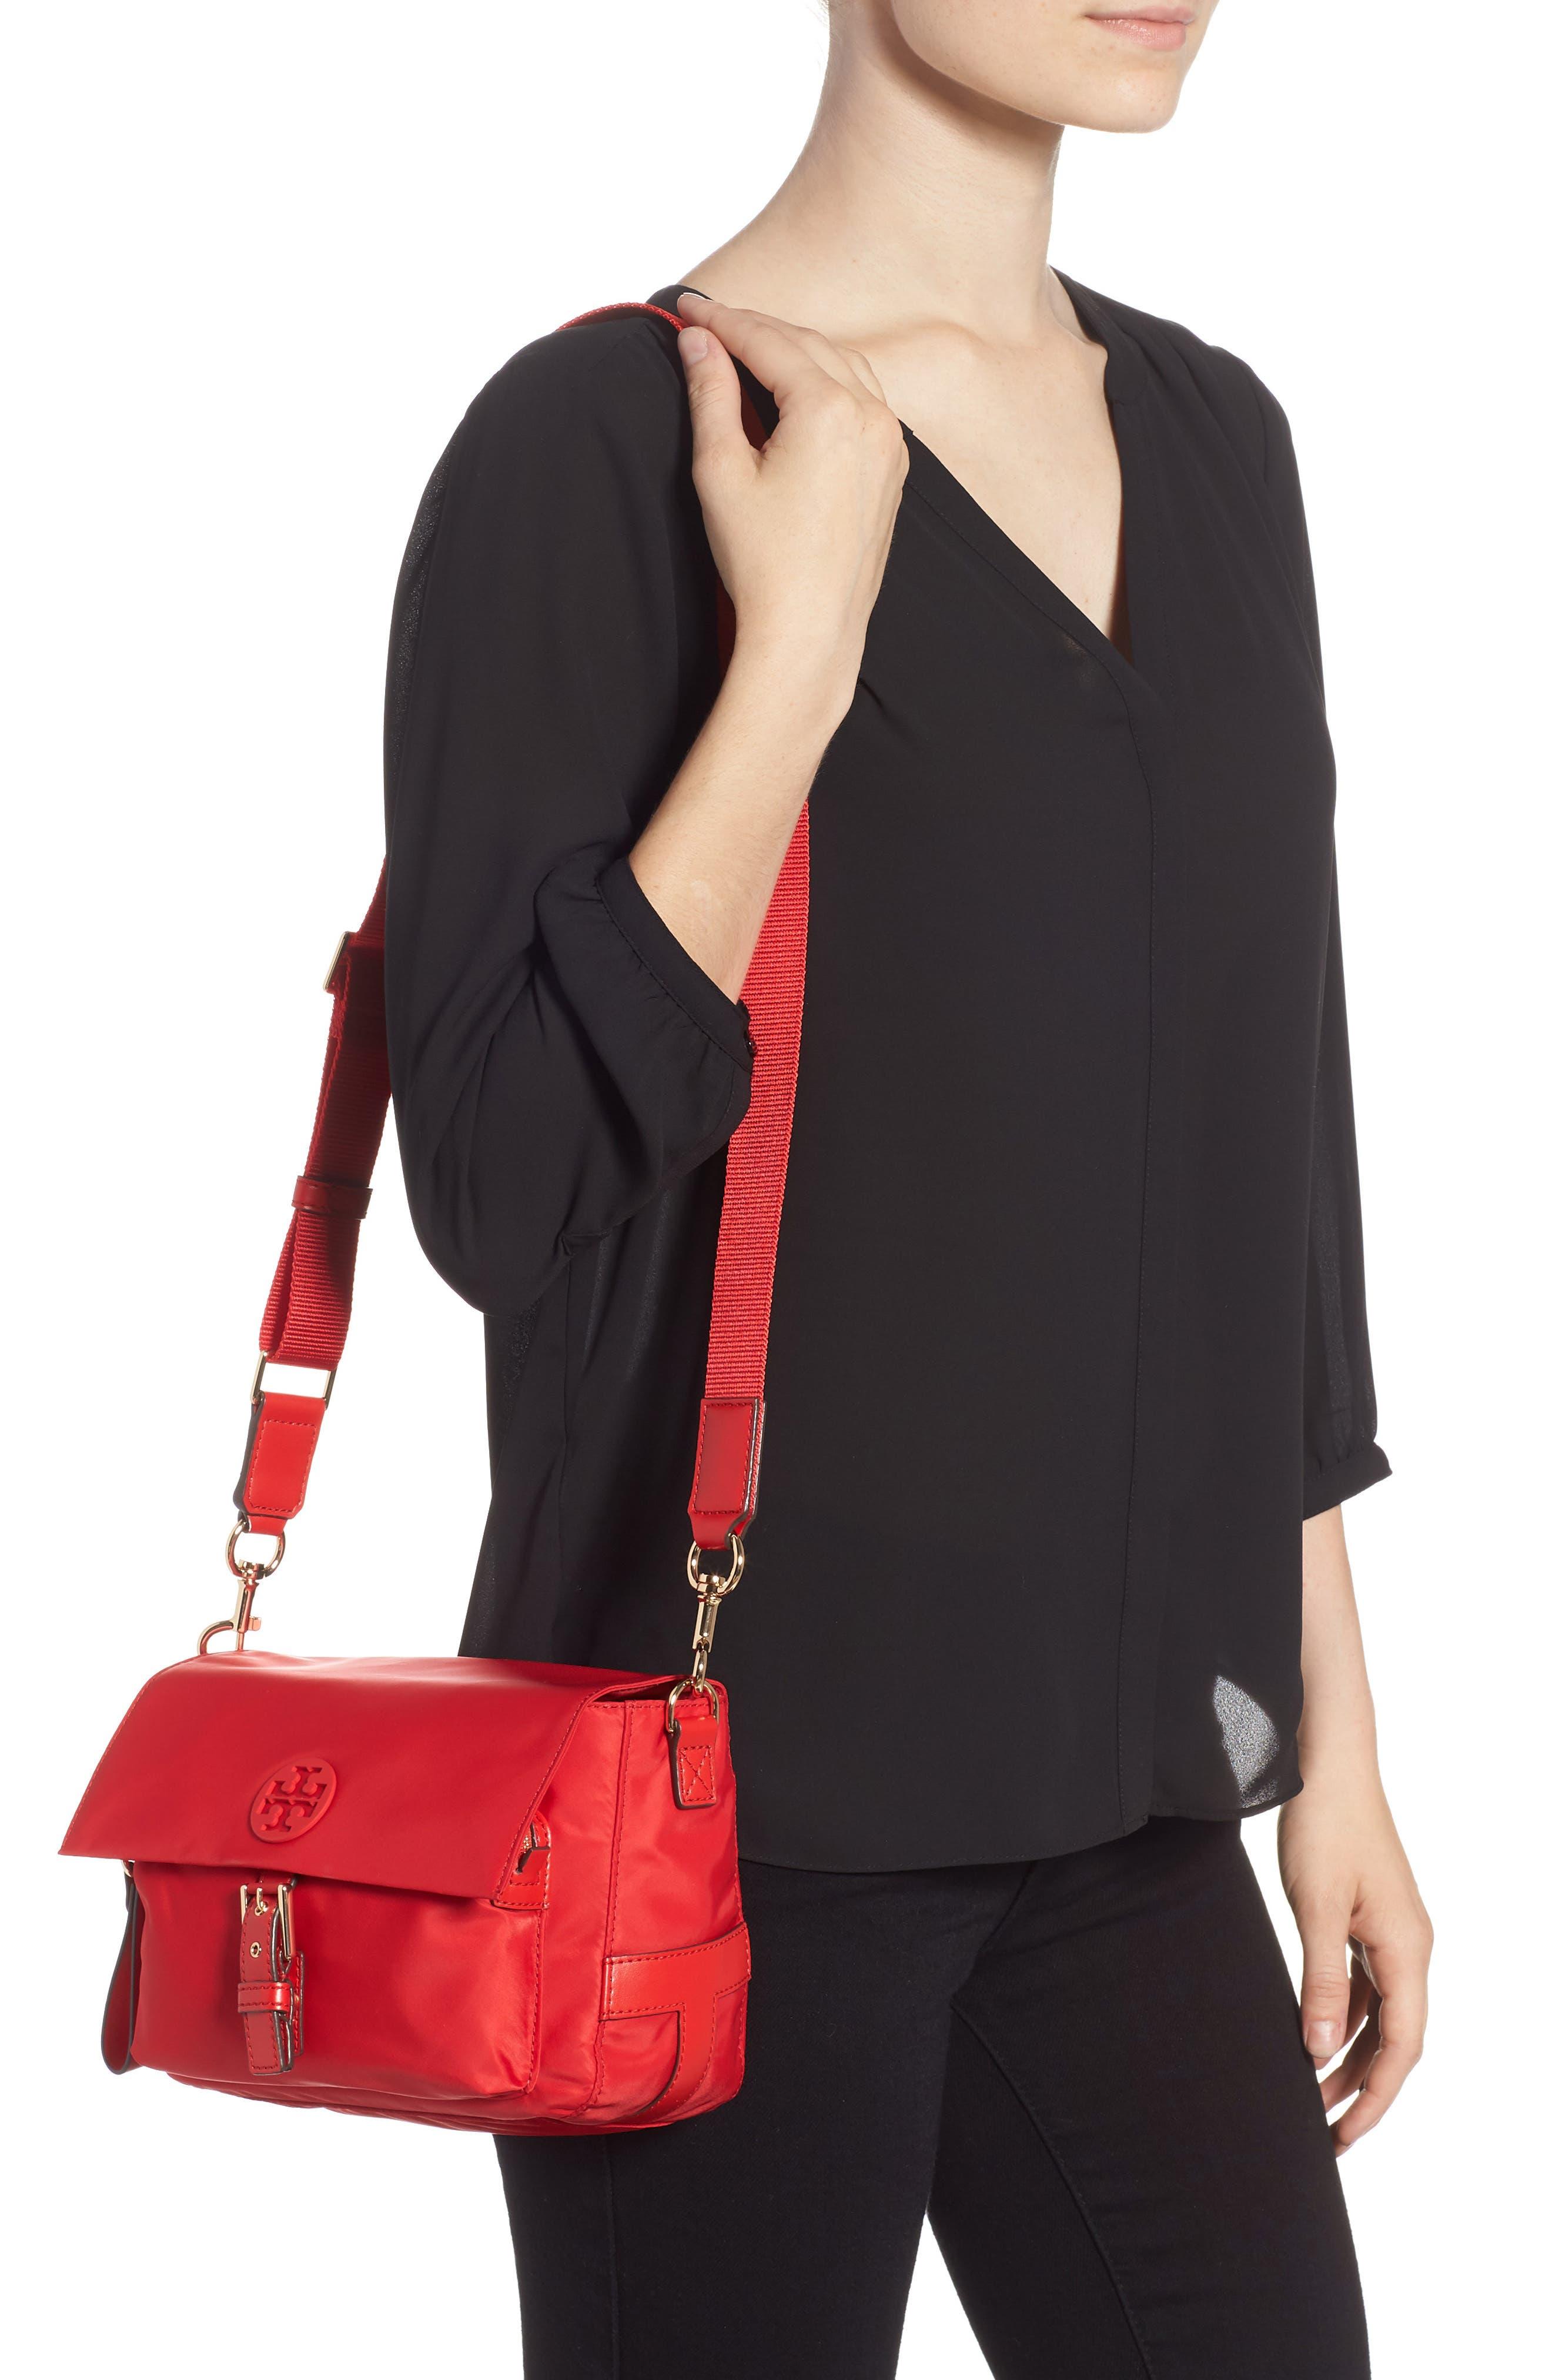 Tilda Nylon Crossbody Bag,                             Alternate thumbnail 2, color,                             BRILLIANT RED